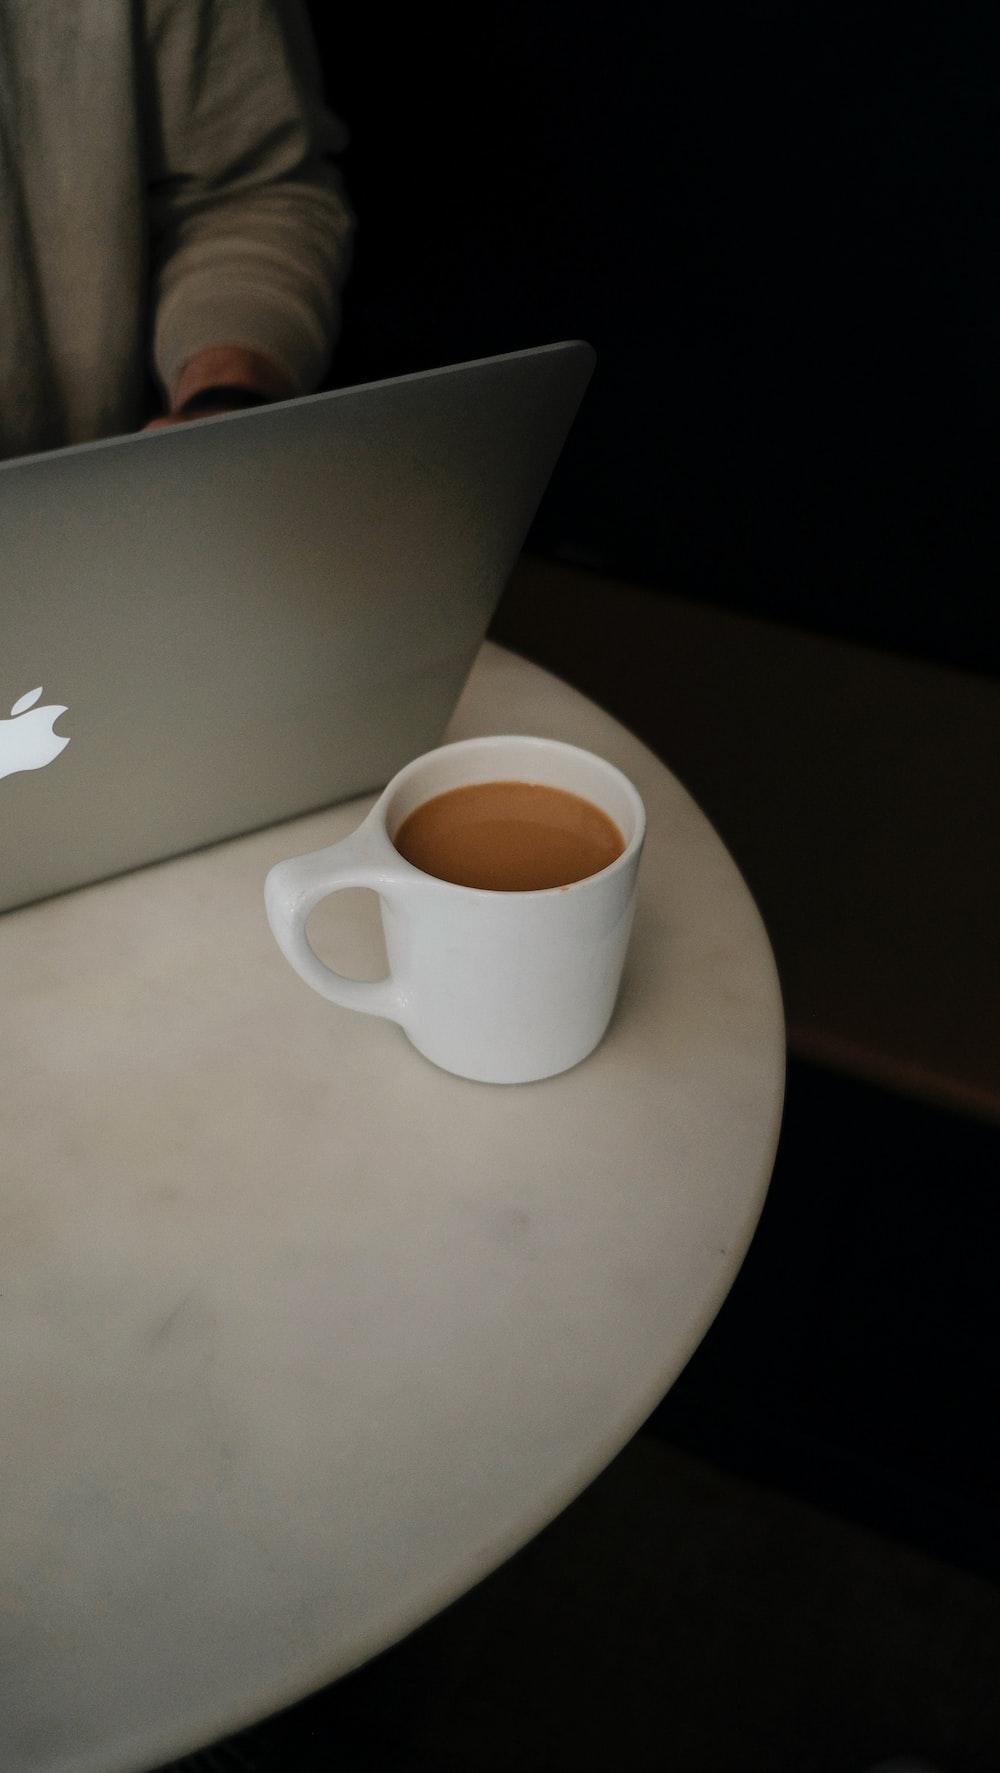 white ceramic mug on silver macbook